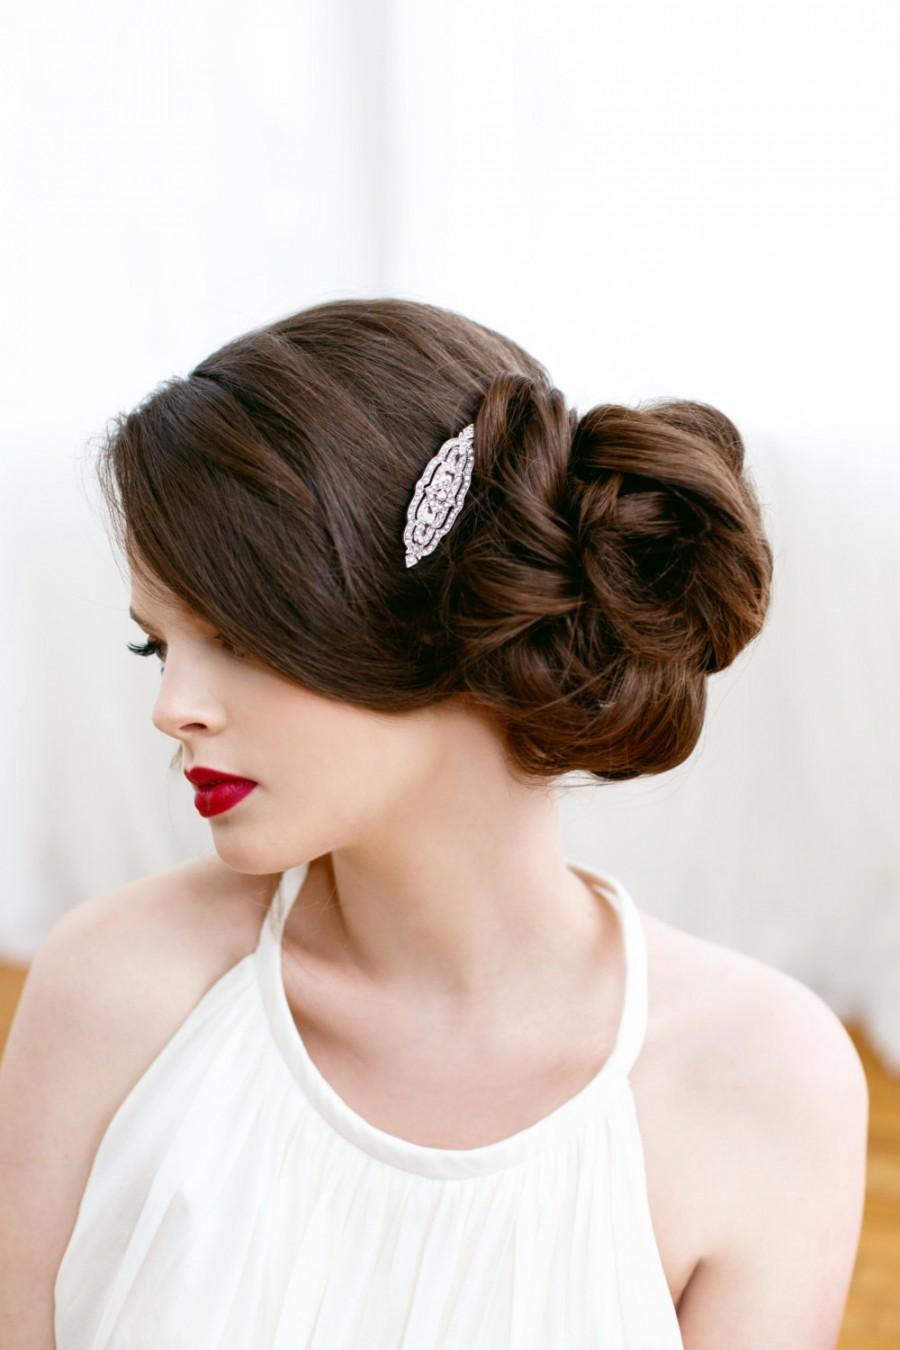 Свадьба - Art Deco Clear Pave Rhinestone Silver Bridal Hair Clip, Great Gatsby, Art Deco, Downton Abbey, Bridal Accessory, Rhinestone Clip CHARLOTTE